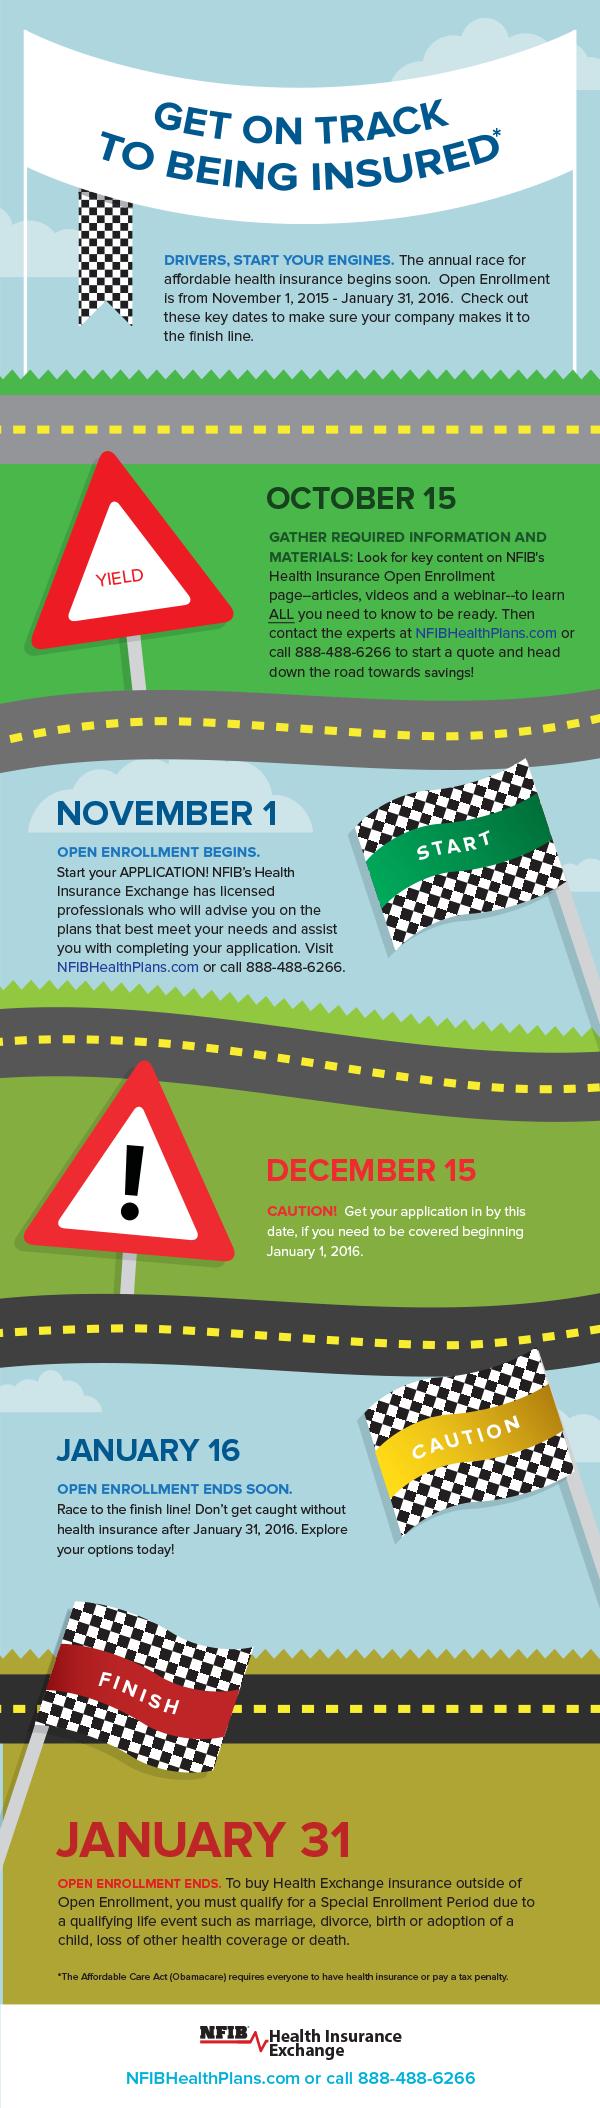 Health-Insurance-Open-Enrollment-2015